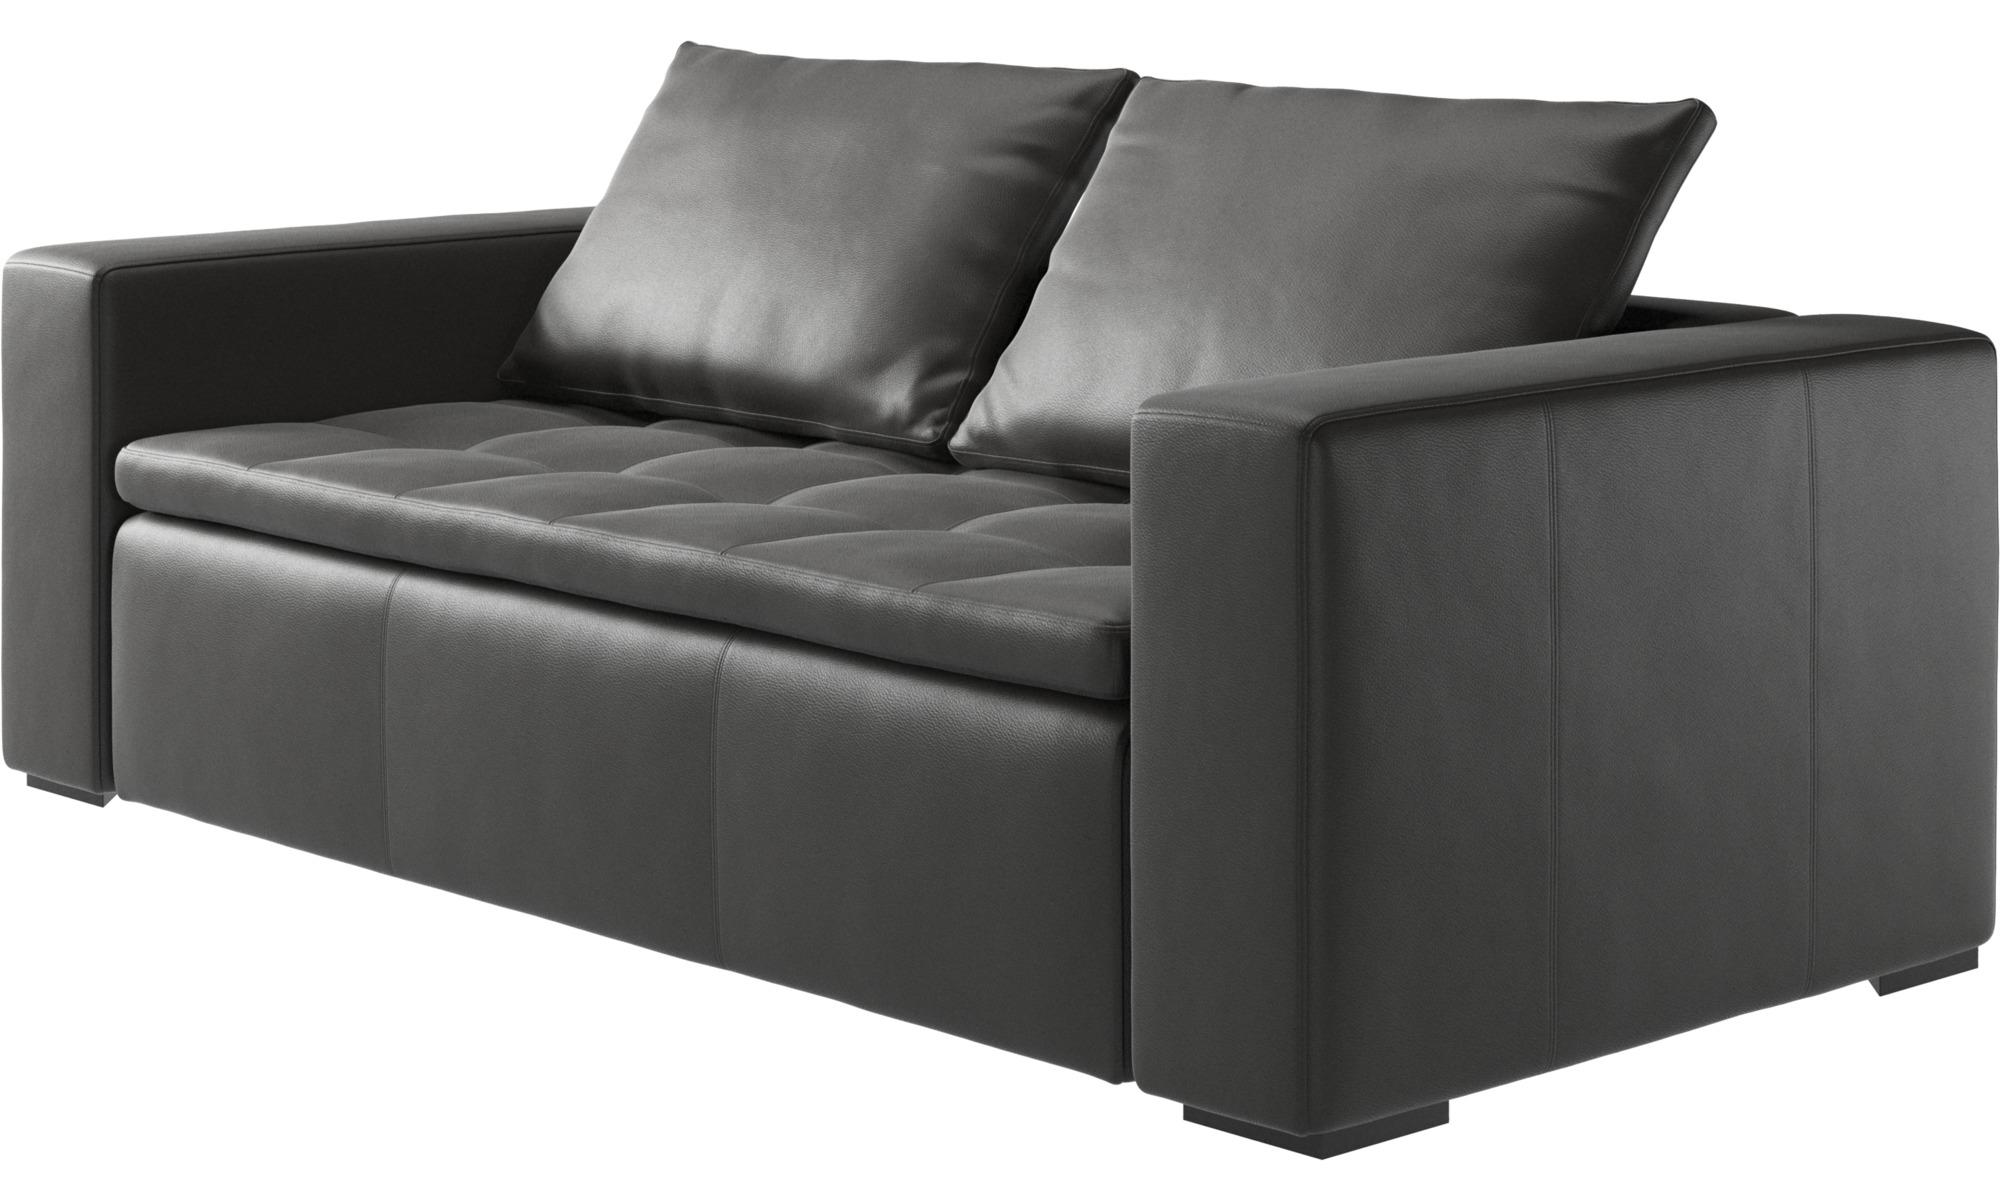 Full Size of Sofa Grau Leder 3er Big Ikea Ledersofas Schillig Lederoptik Chesterfield Joop Musterring Garnitur 3 Teilig Schlaffunktion Günstig Kaufen Stoff Bunt Hocker U Sofa Sofa Grau Leder